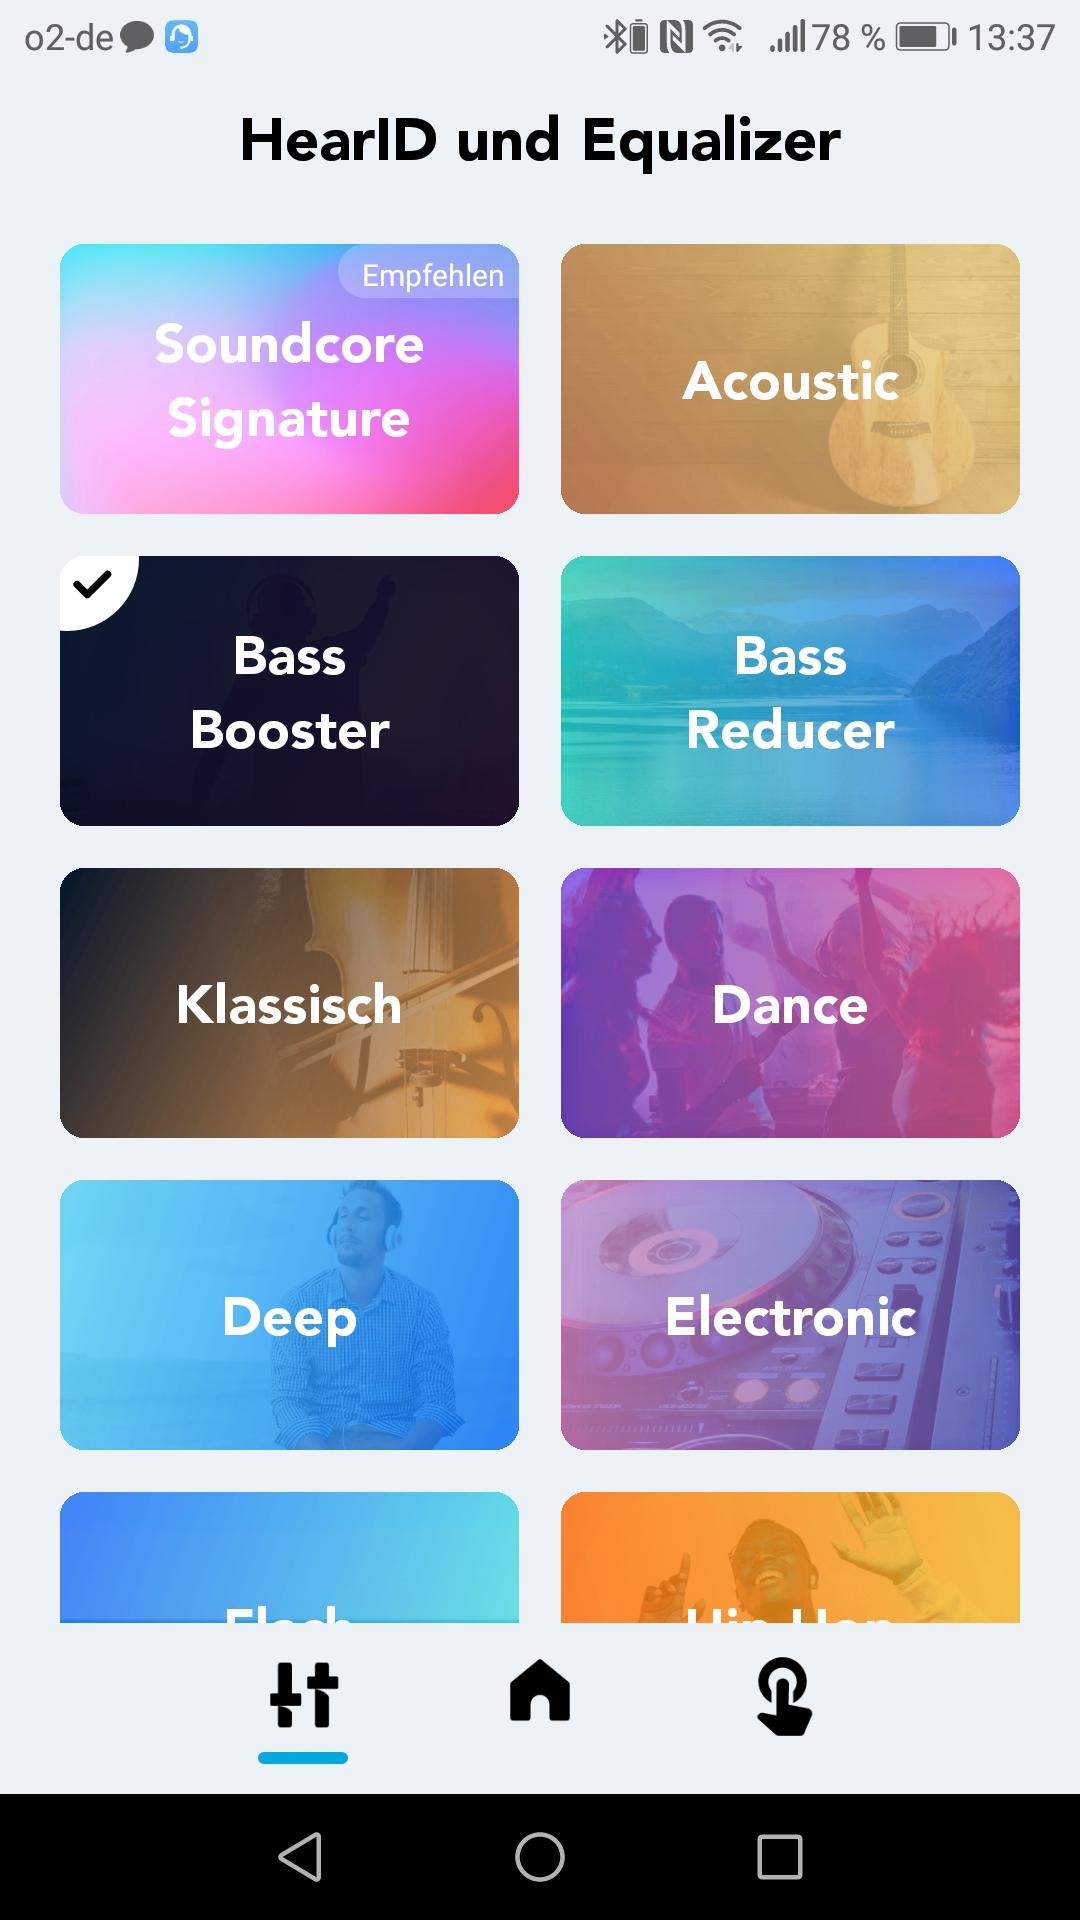 Soundcore App Equalizer Uebersicht